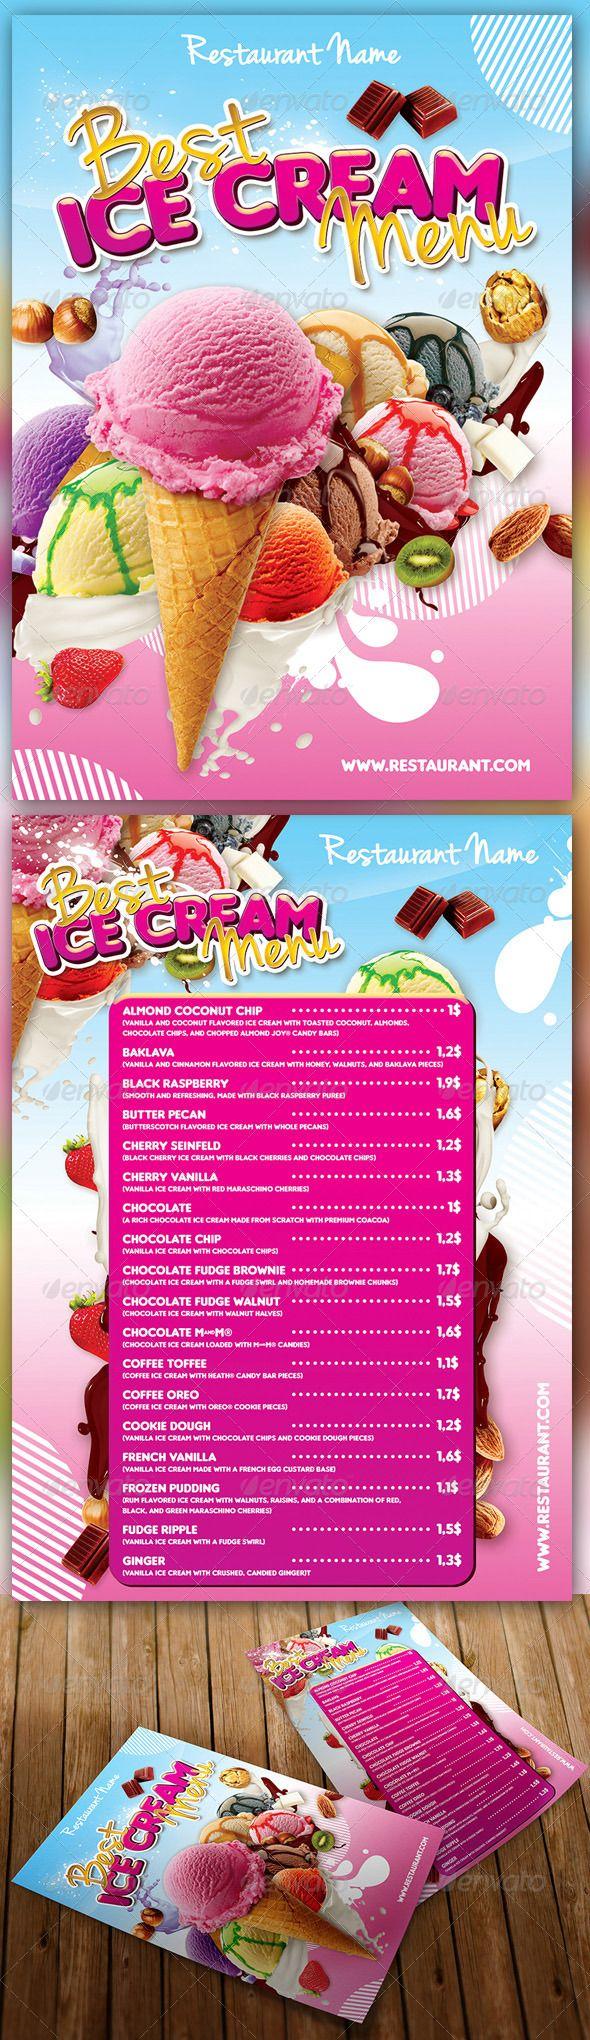 Ice Cream Menu | Ice cream menu, Food menu and Print templates